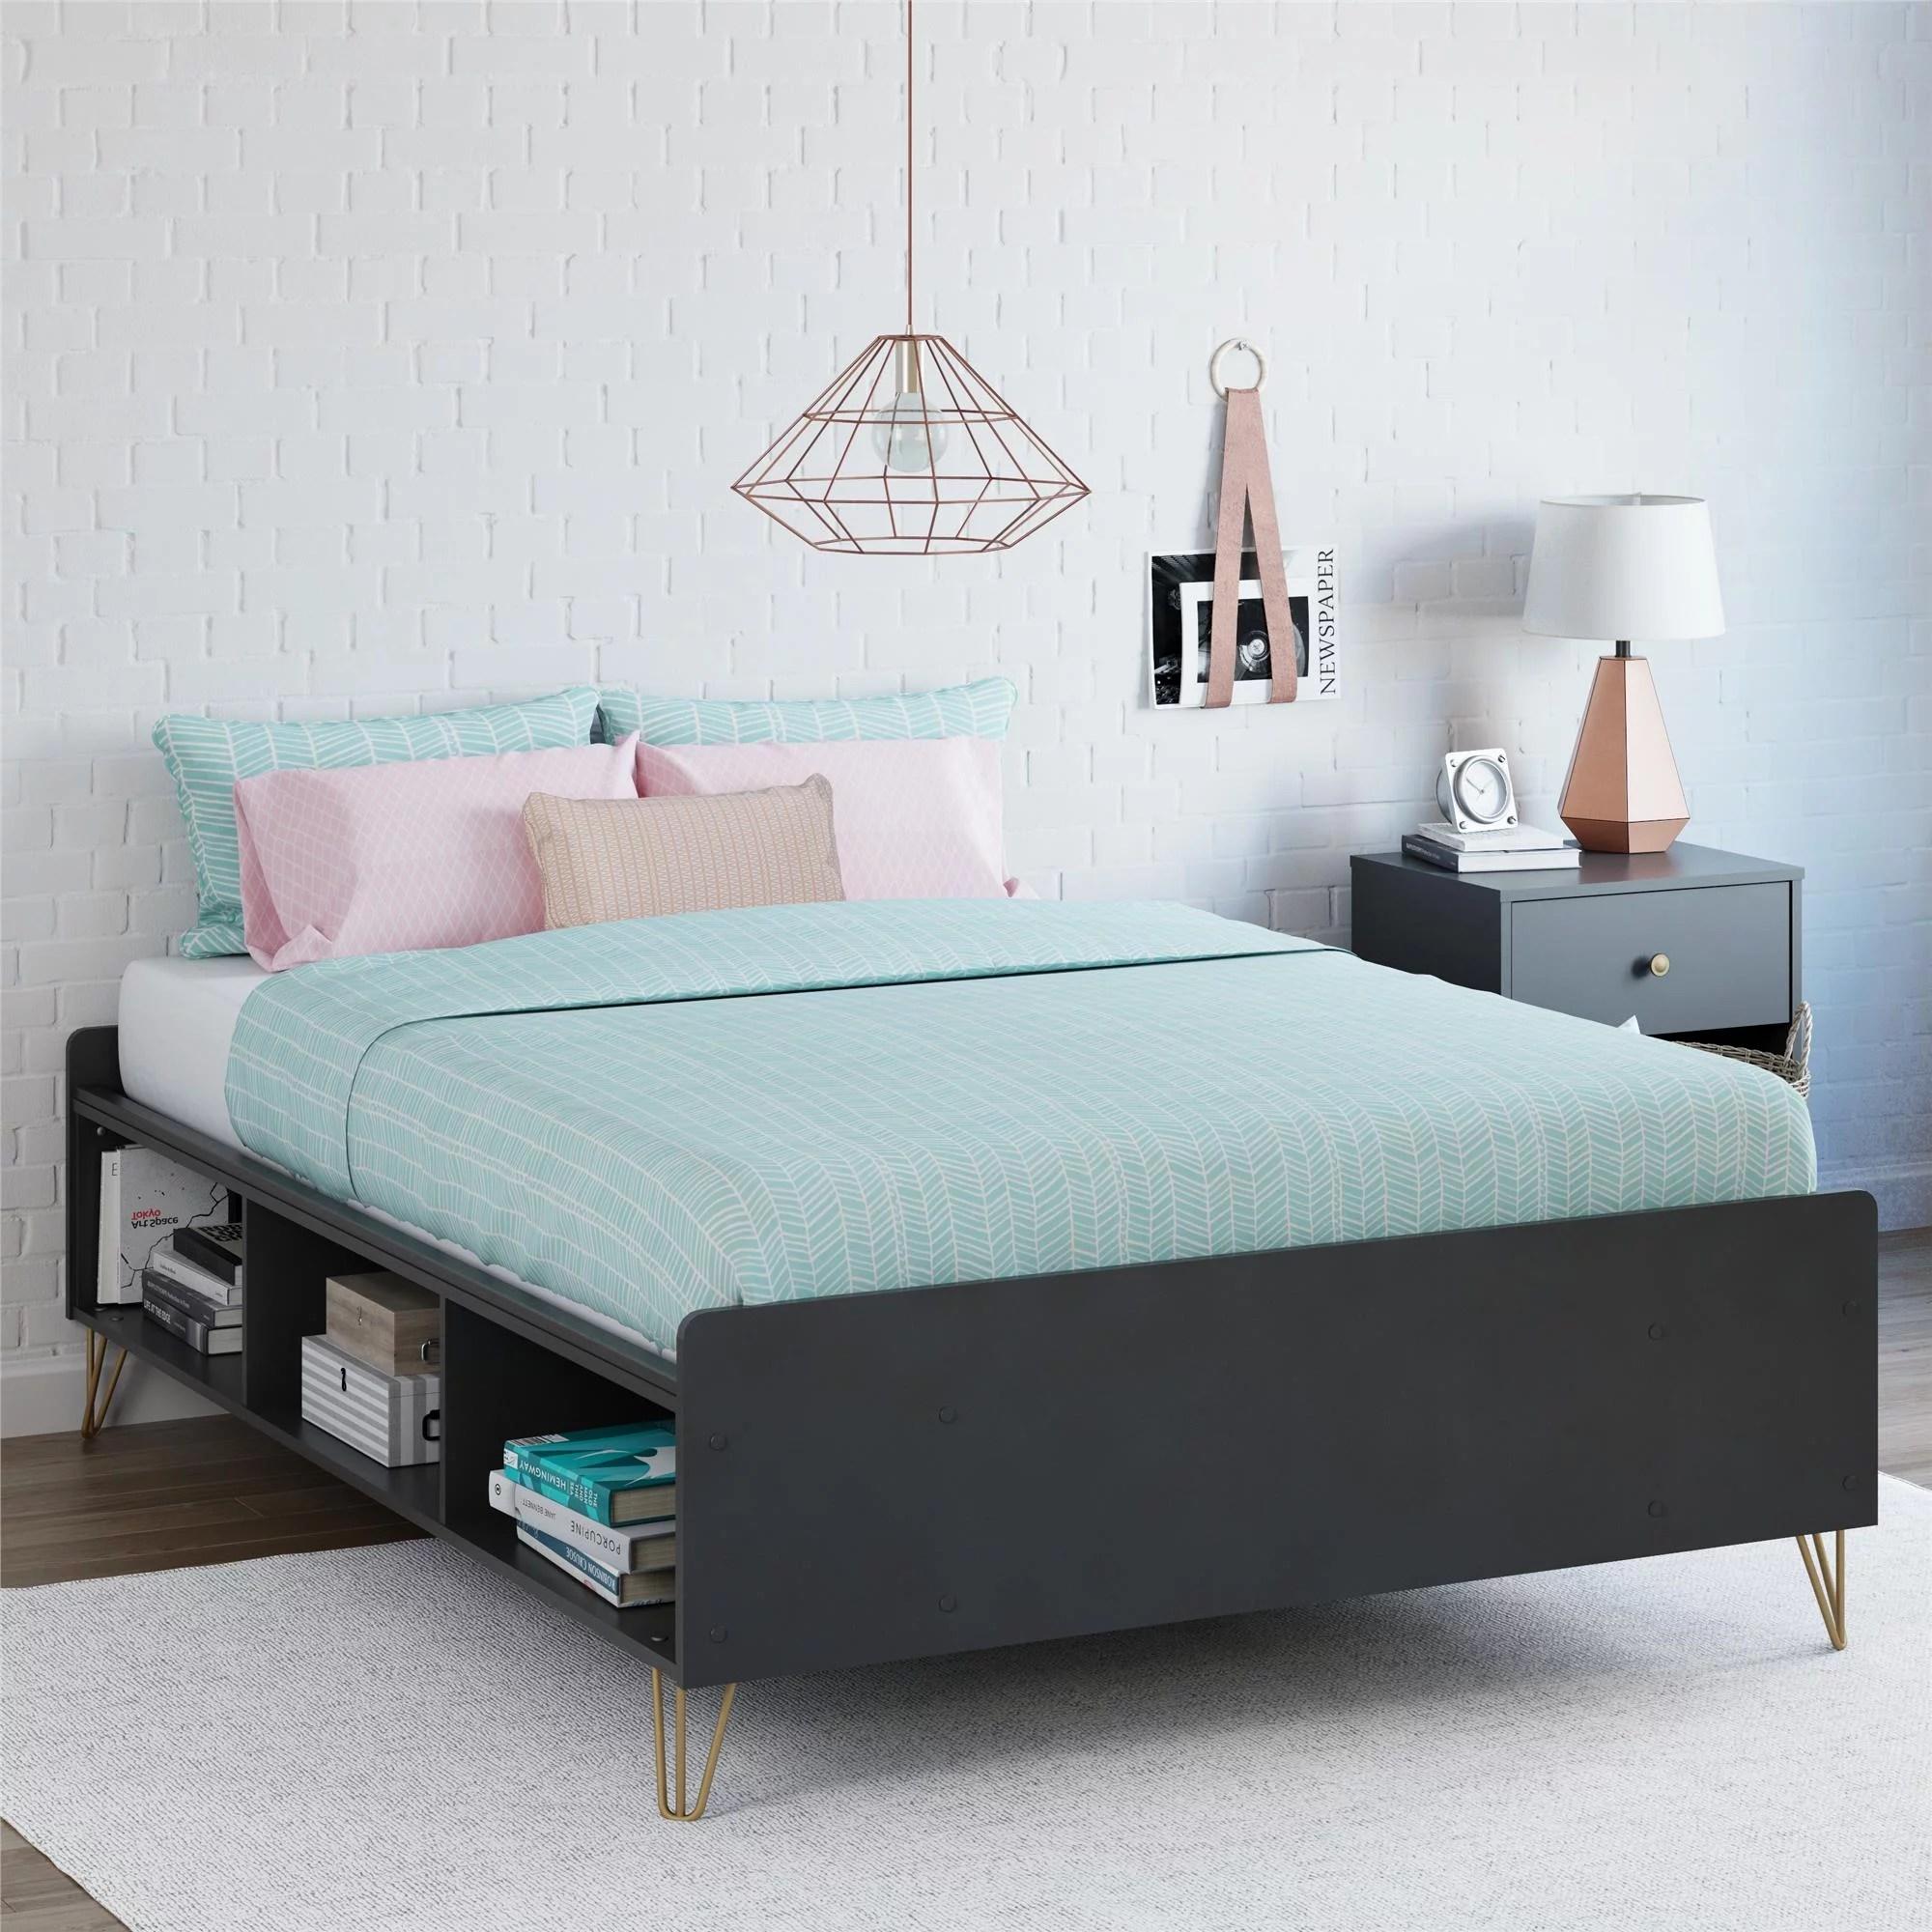 Best Space Saving Beds Popsugar Home